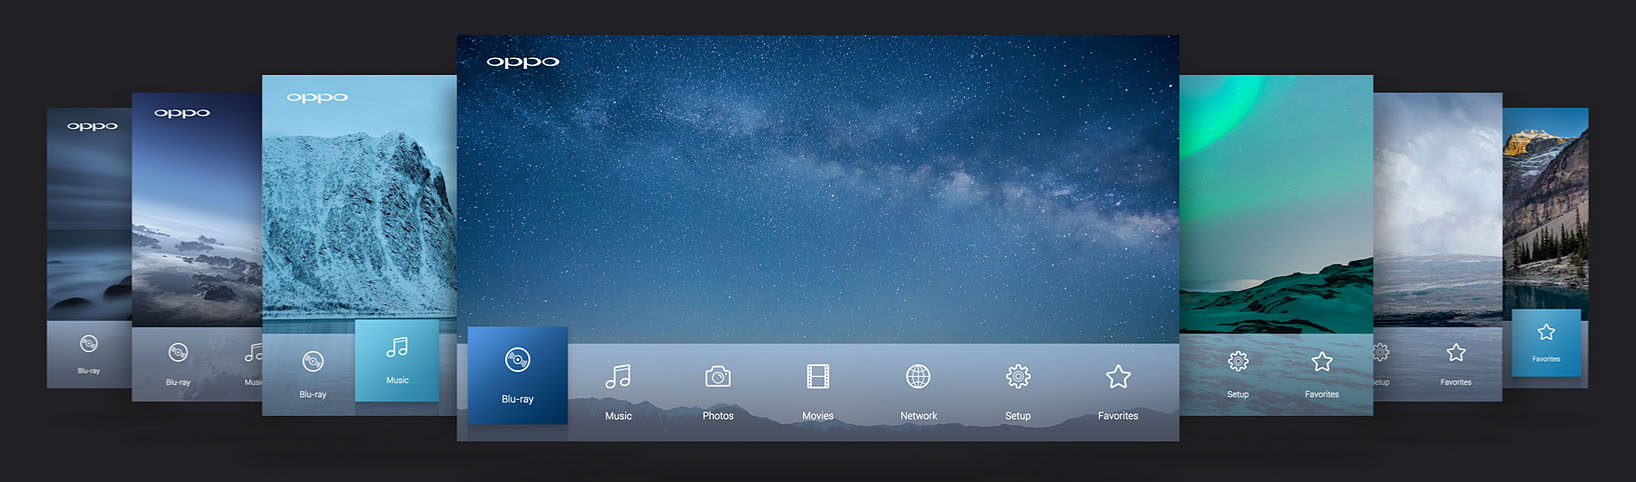 Oppo UDP-203 4K Bluray Universal Player + Jailbreak + Premium Mod! Udp4